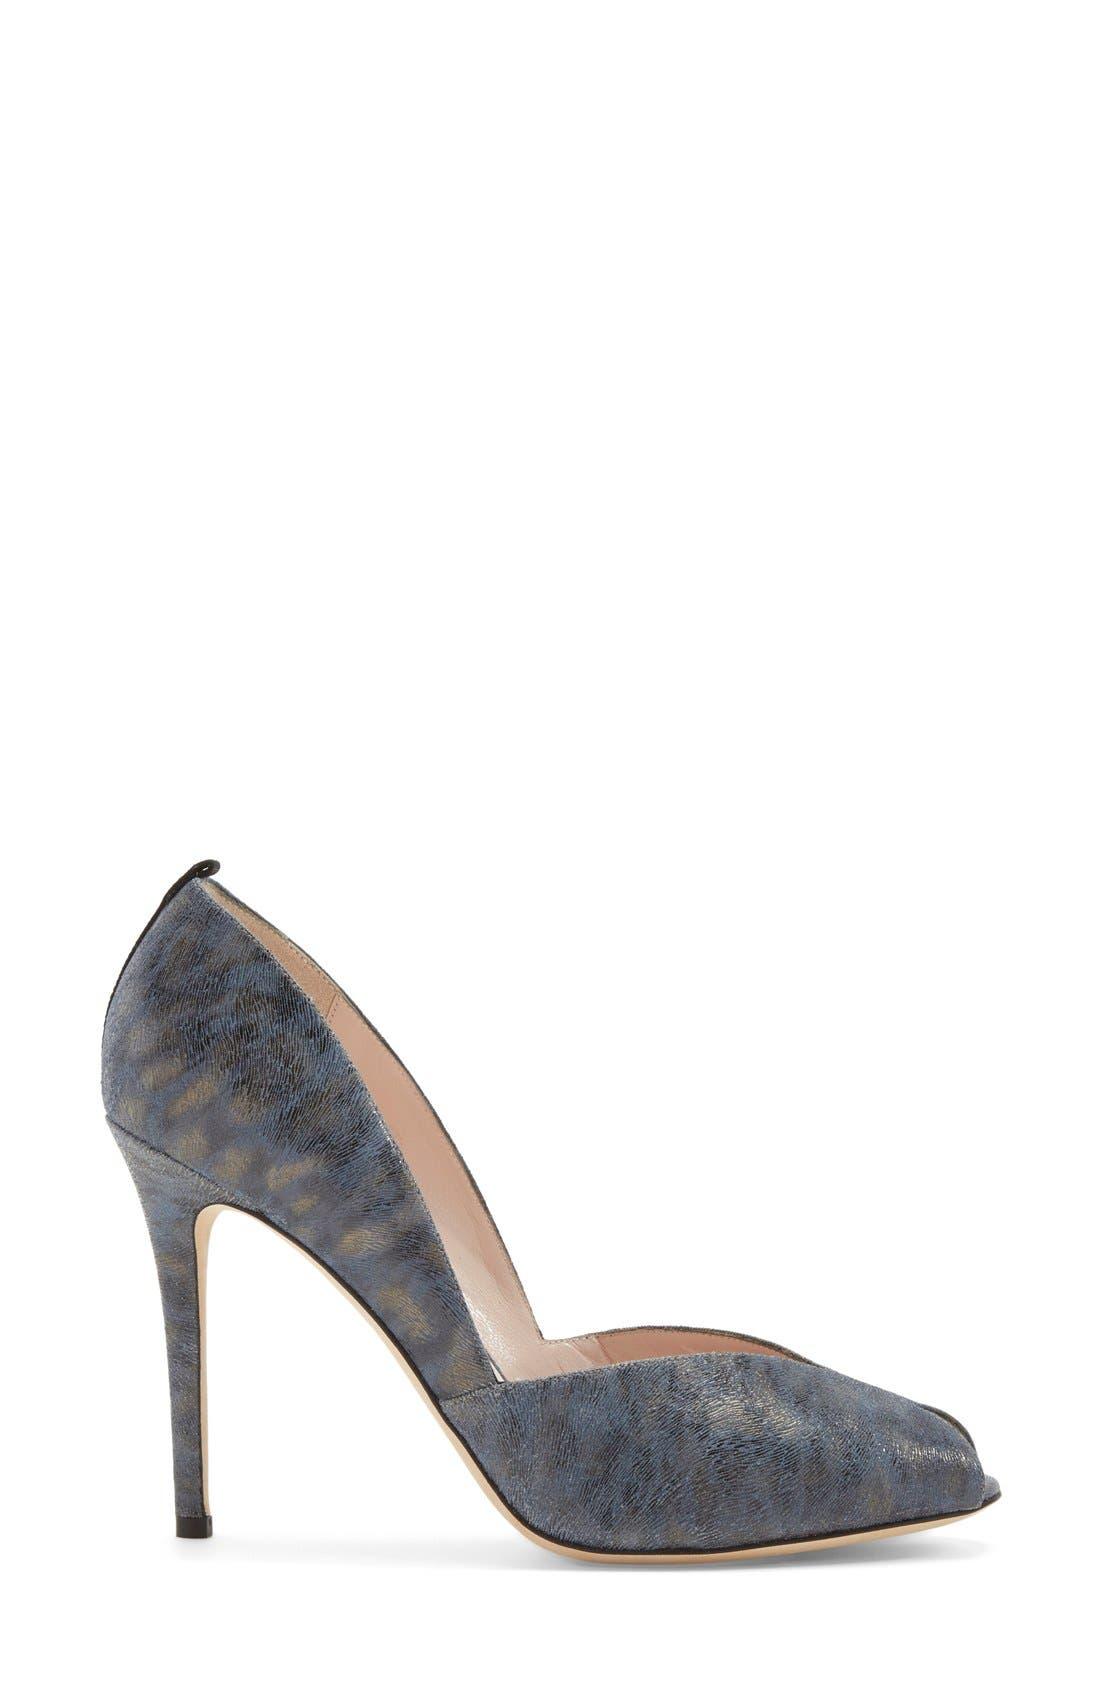 'Naomi' Peep Toe Pump,                             Alternate thumbnail 4, color,                             Blue Leopard Leather